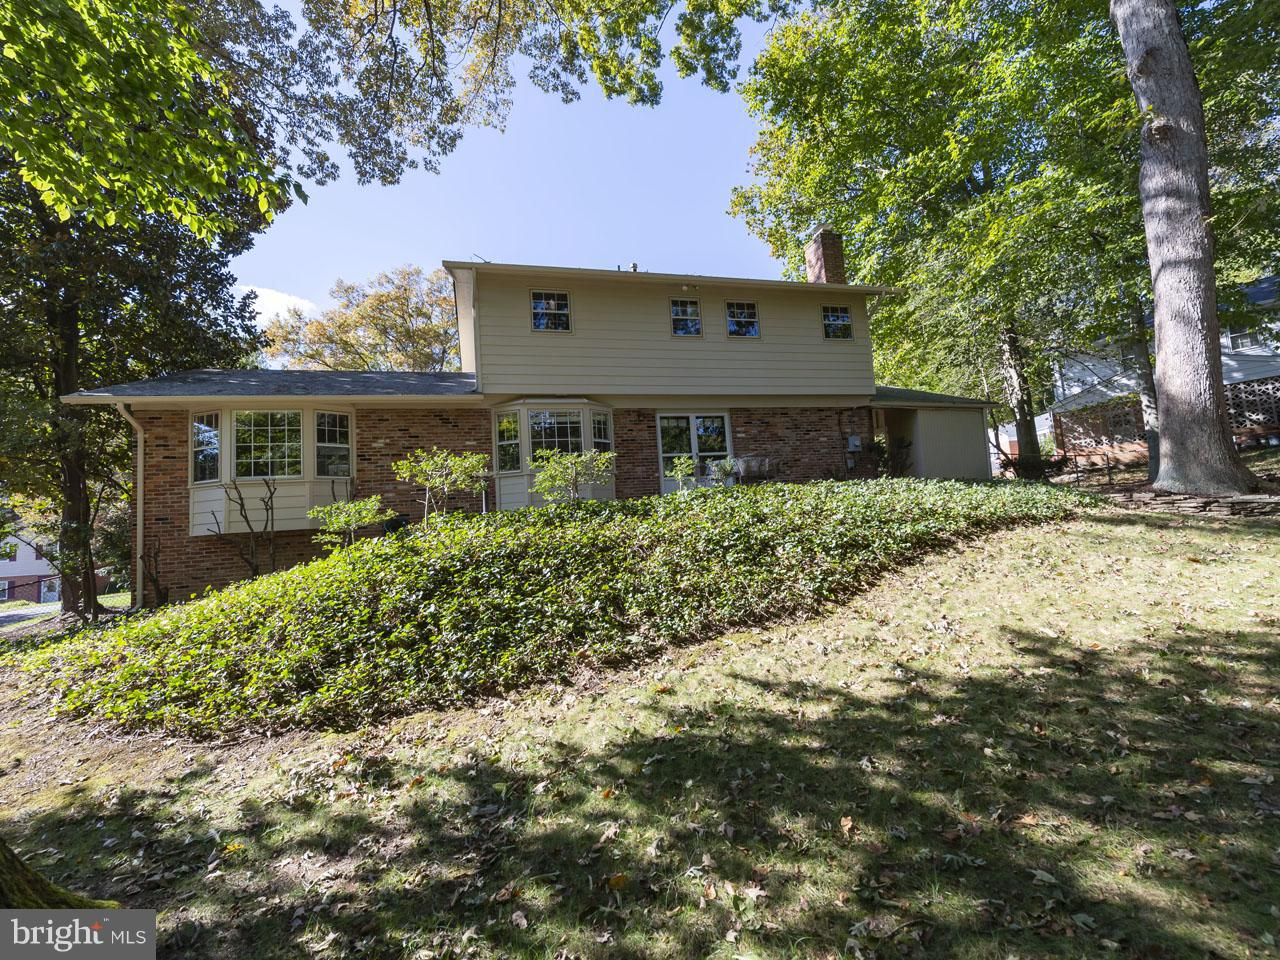 1010014728-300953035334-2021-09-05-13-50-26  |   | Annandale Delaware Real Estate For Sale | MLS# 1010014728  - Best of Northern Virginia